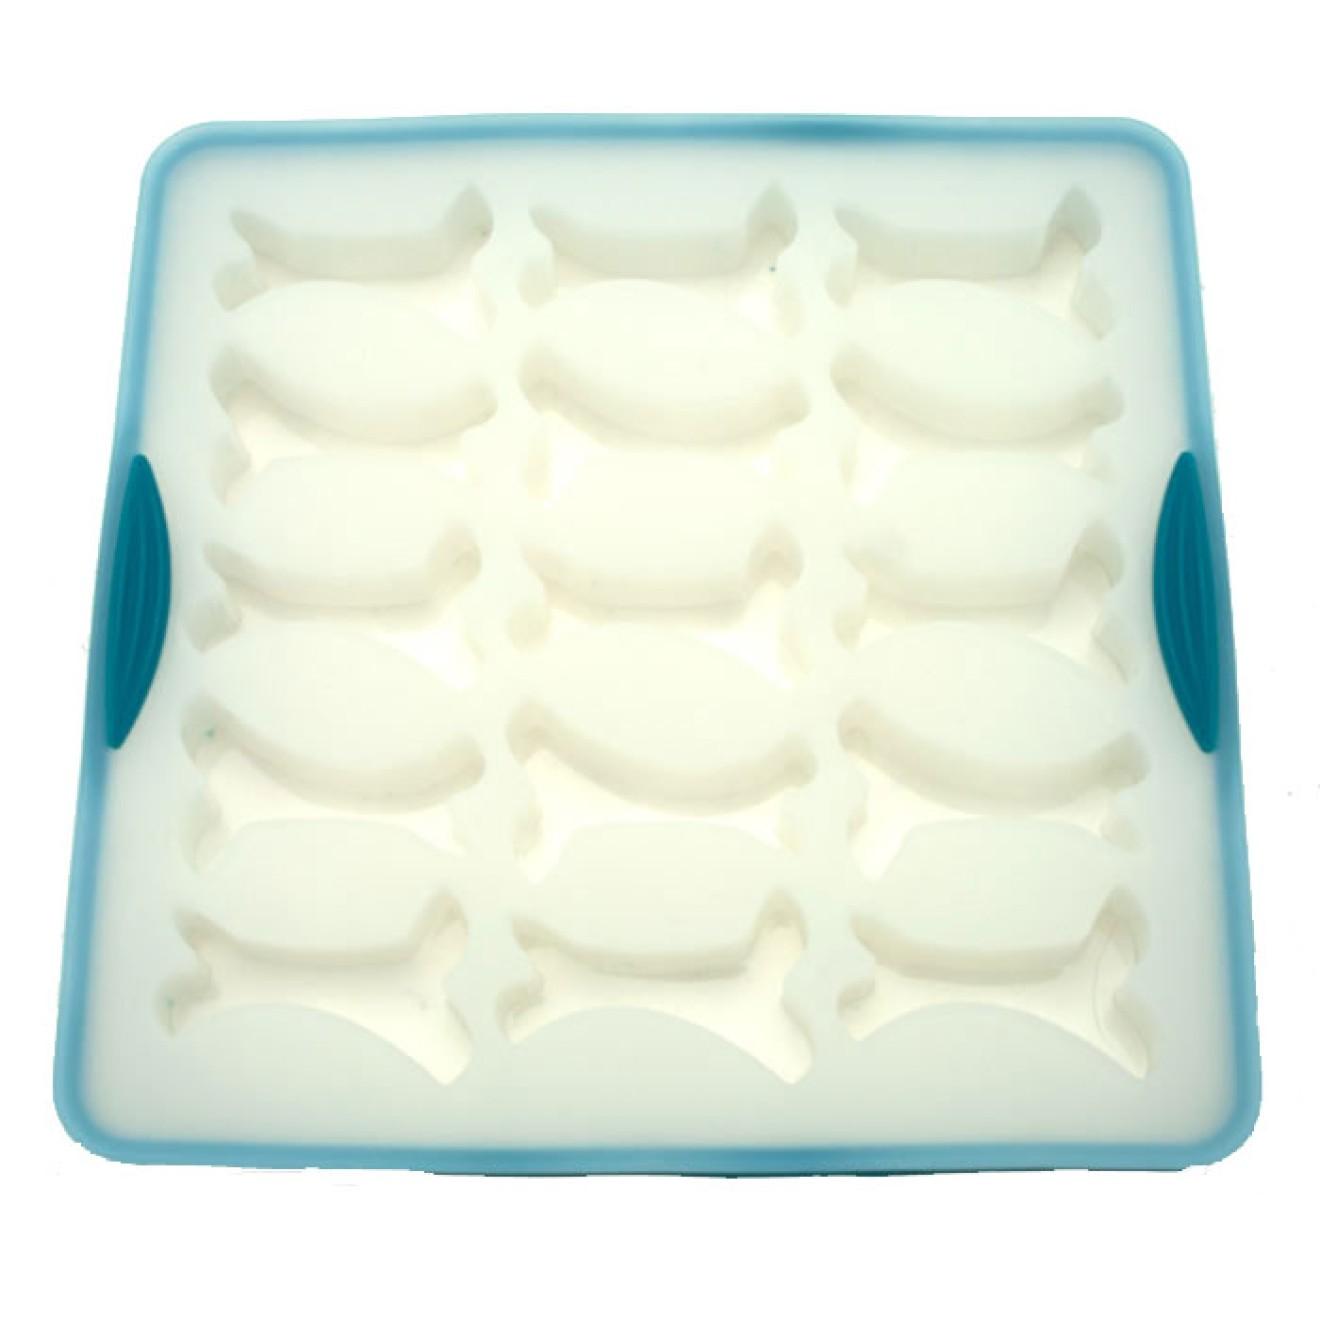 silikon backform f r hundekekse in 2 gr ssen silikon backform hundekuchen. Black Bedroom Furniture Sets. Home Design Ideas